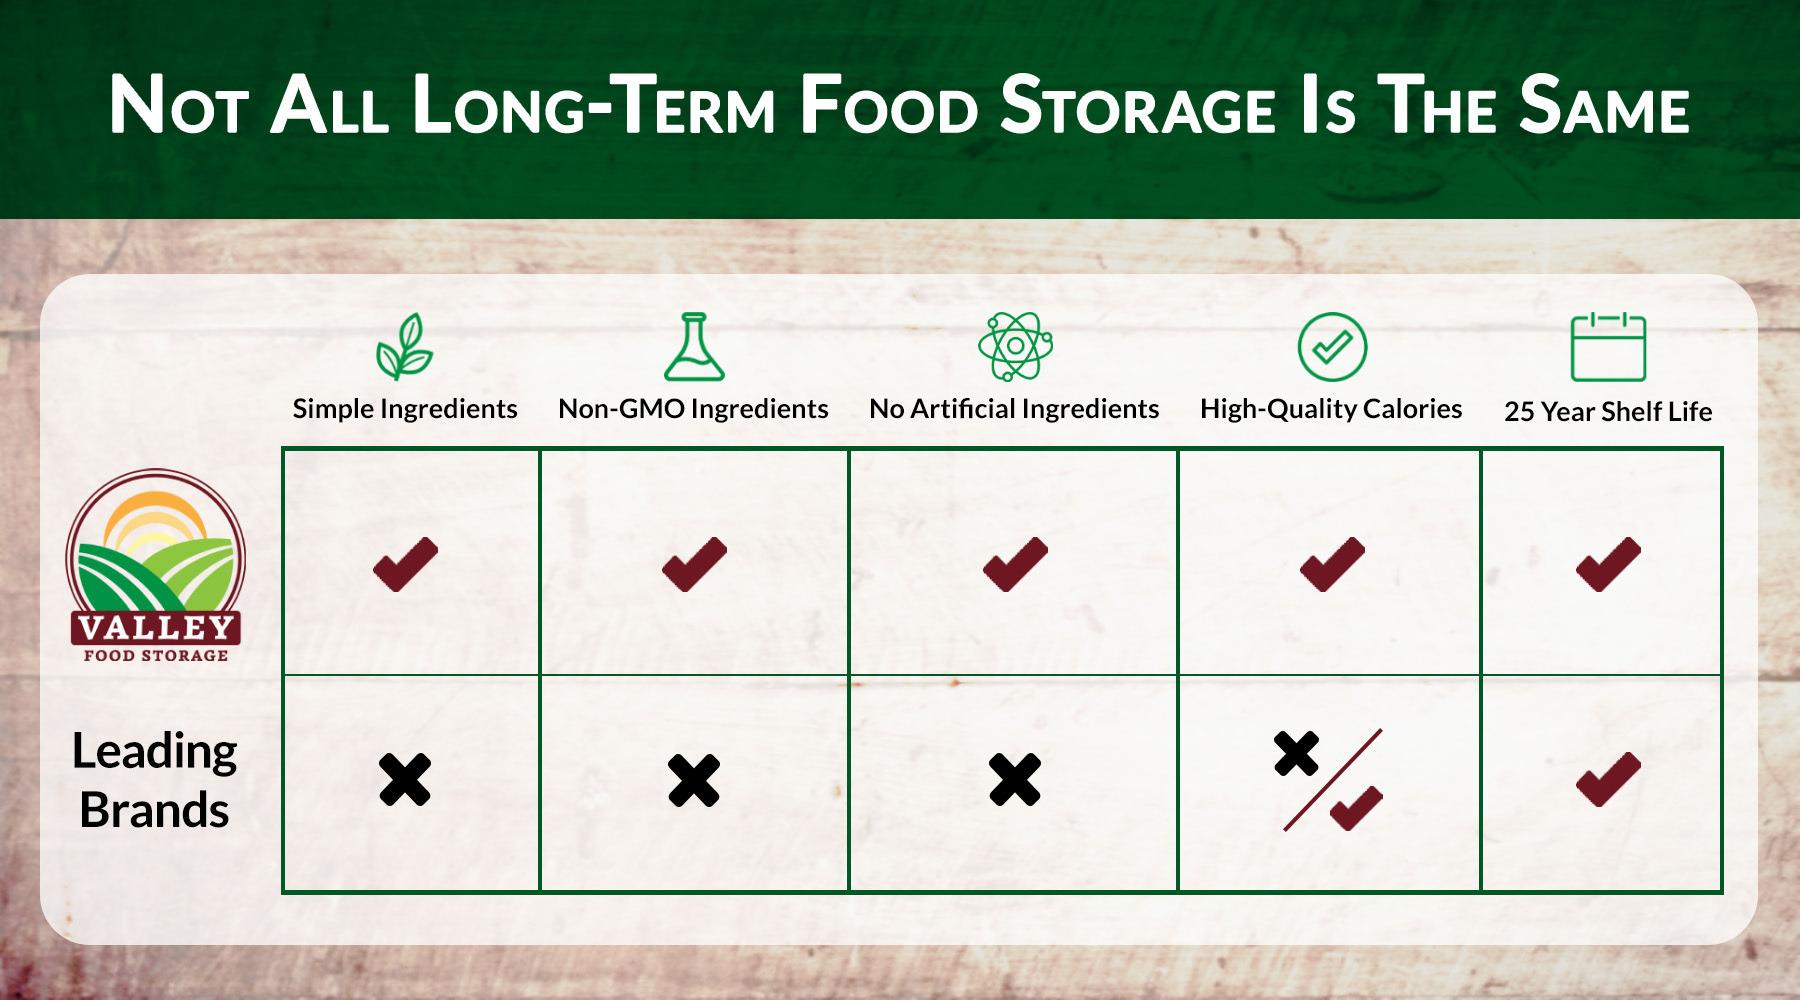 Long term food storage brands